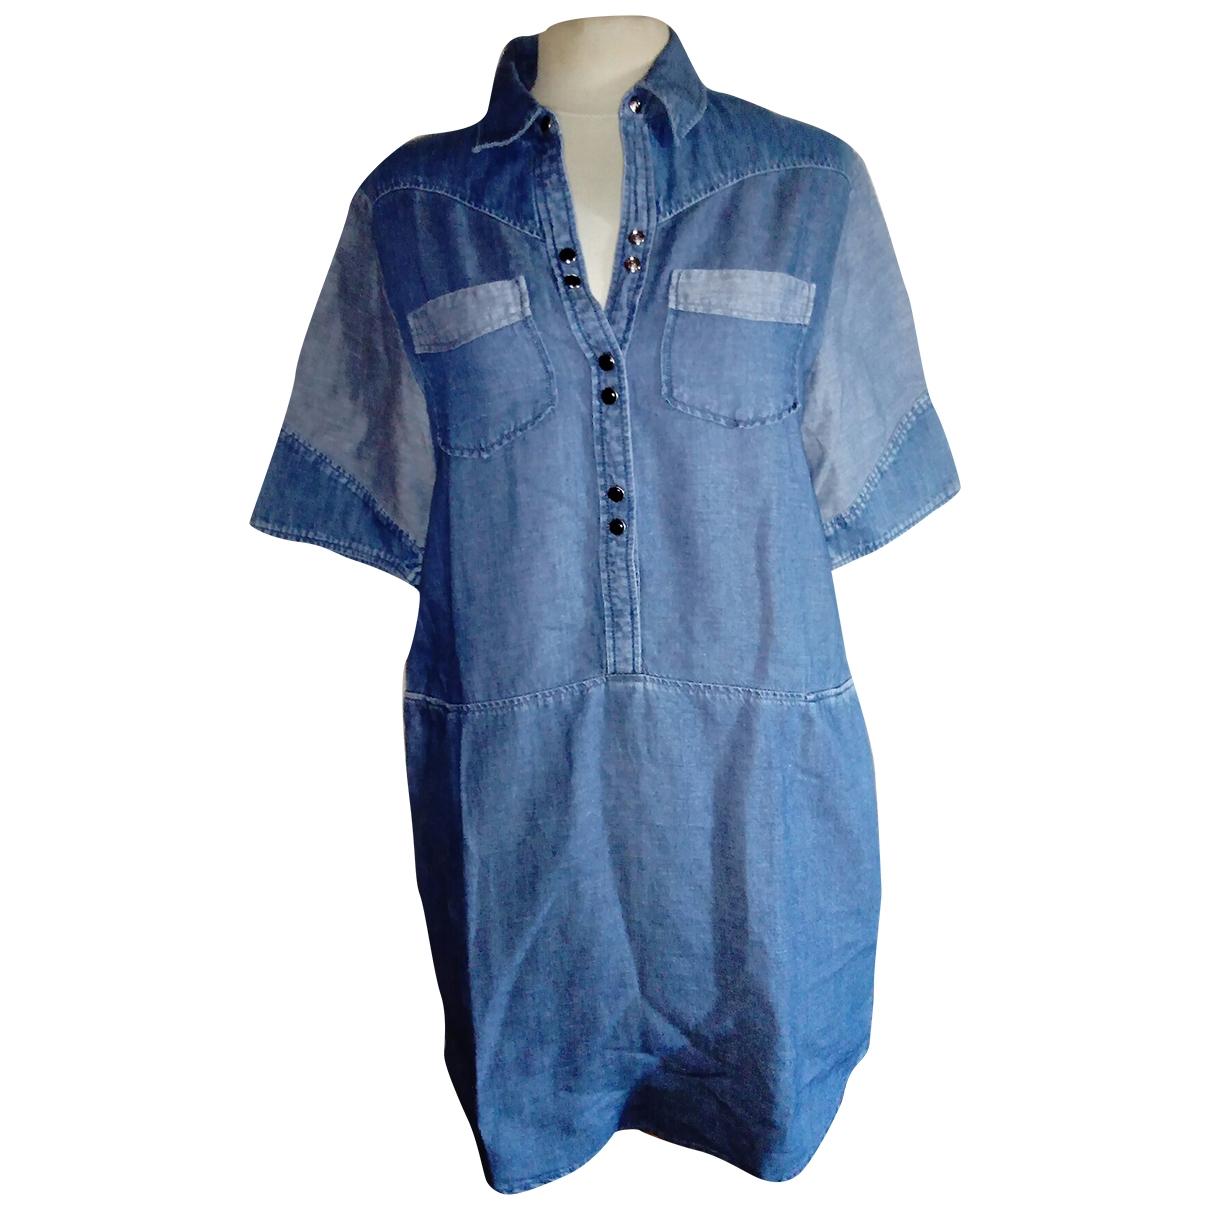 Maje \N Blue Denim - Jeans dress for Women 36 FR